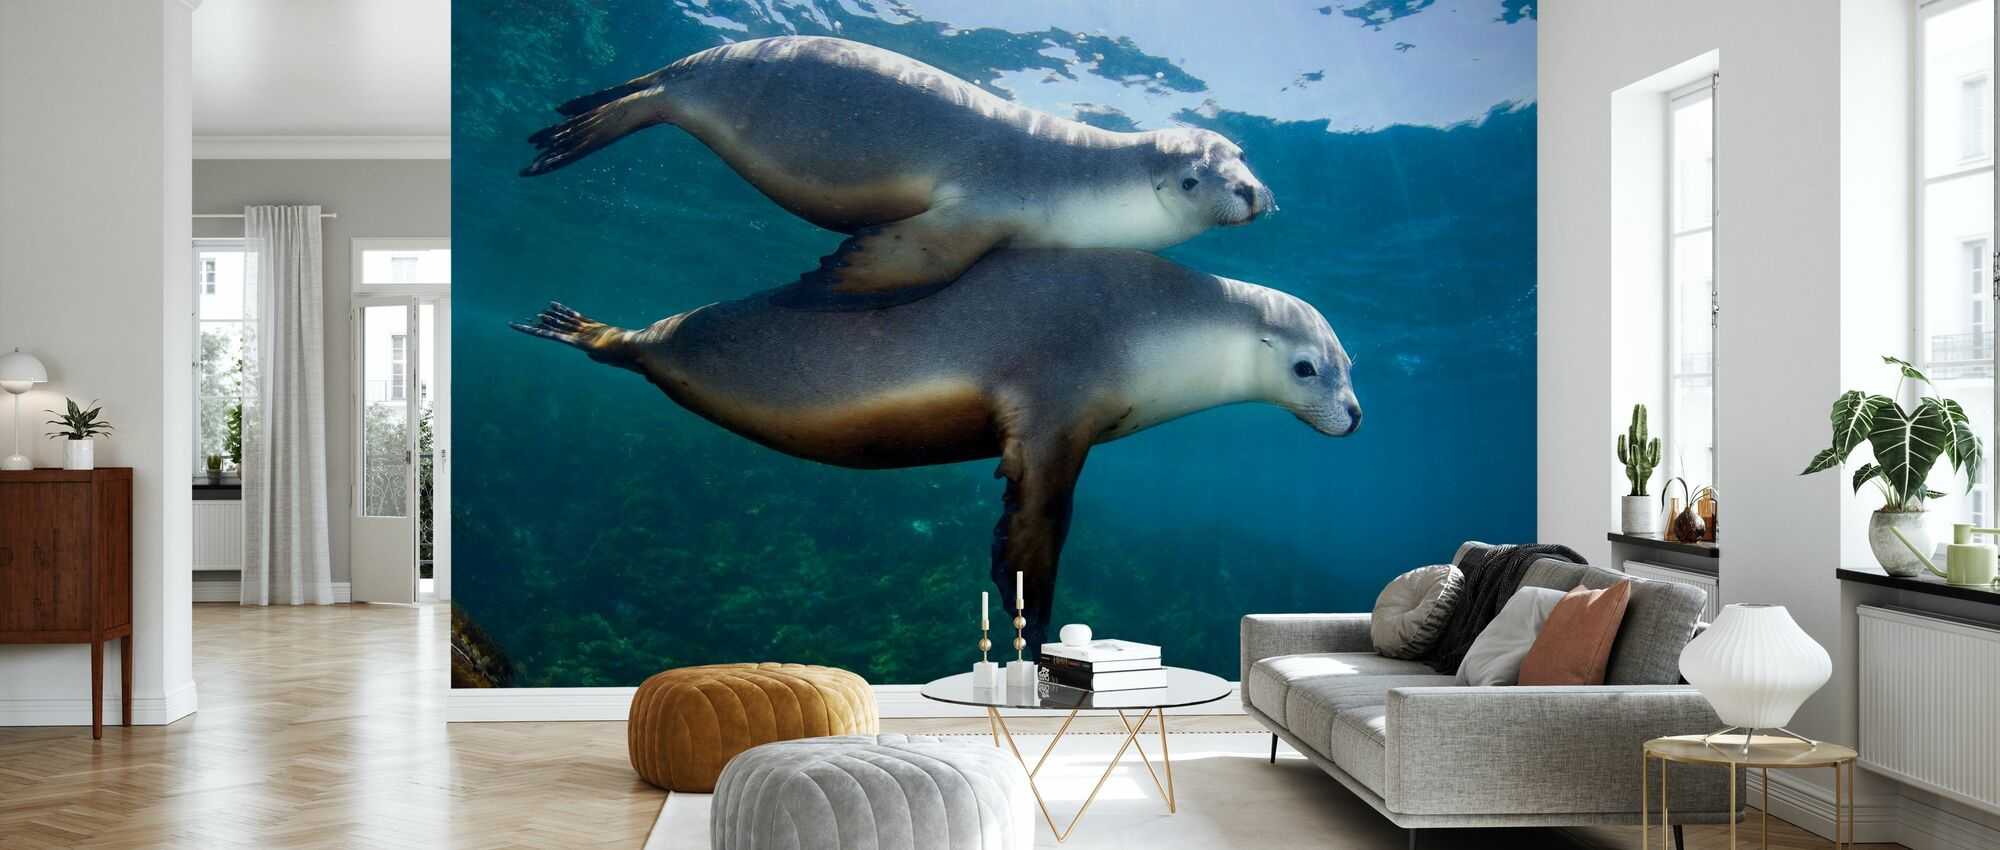 Pari merileijonia - Tapetti - Olohuone